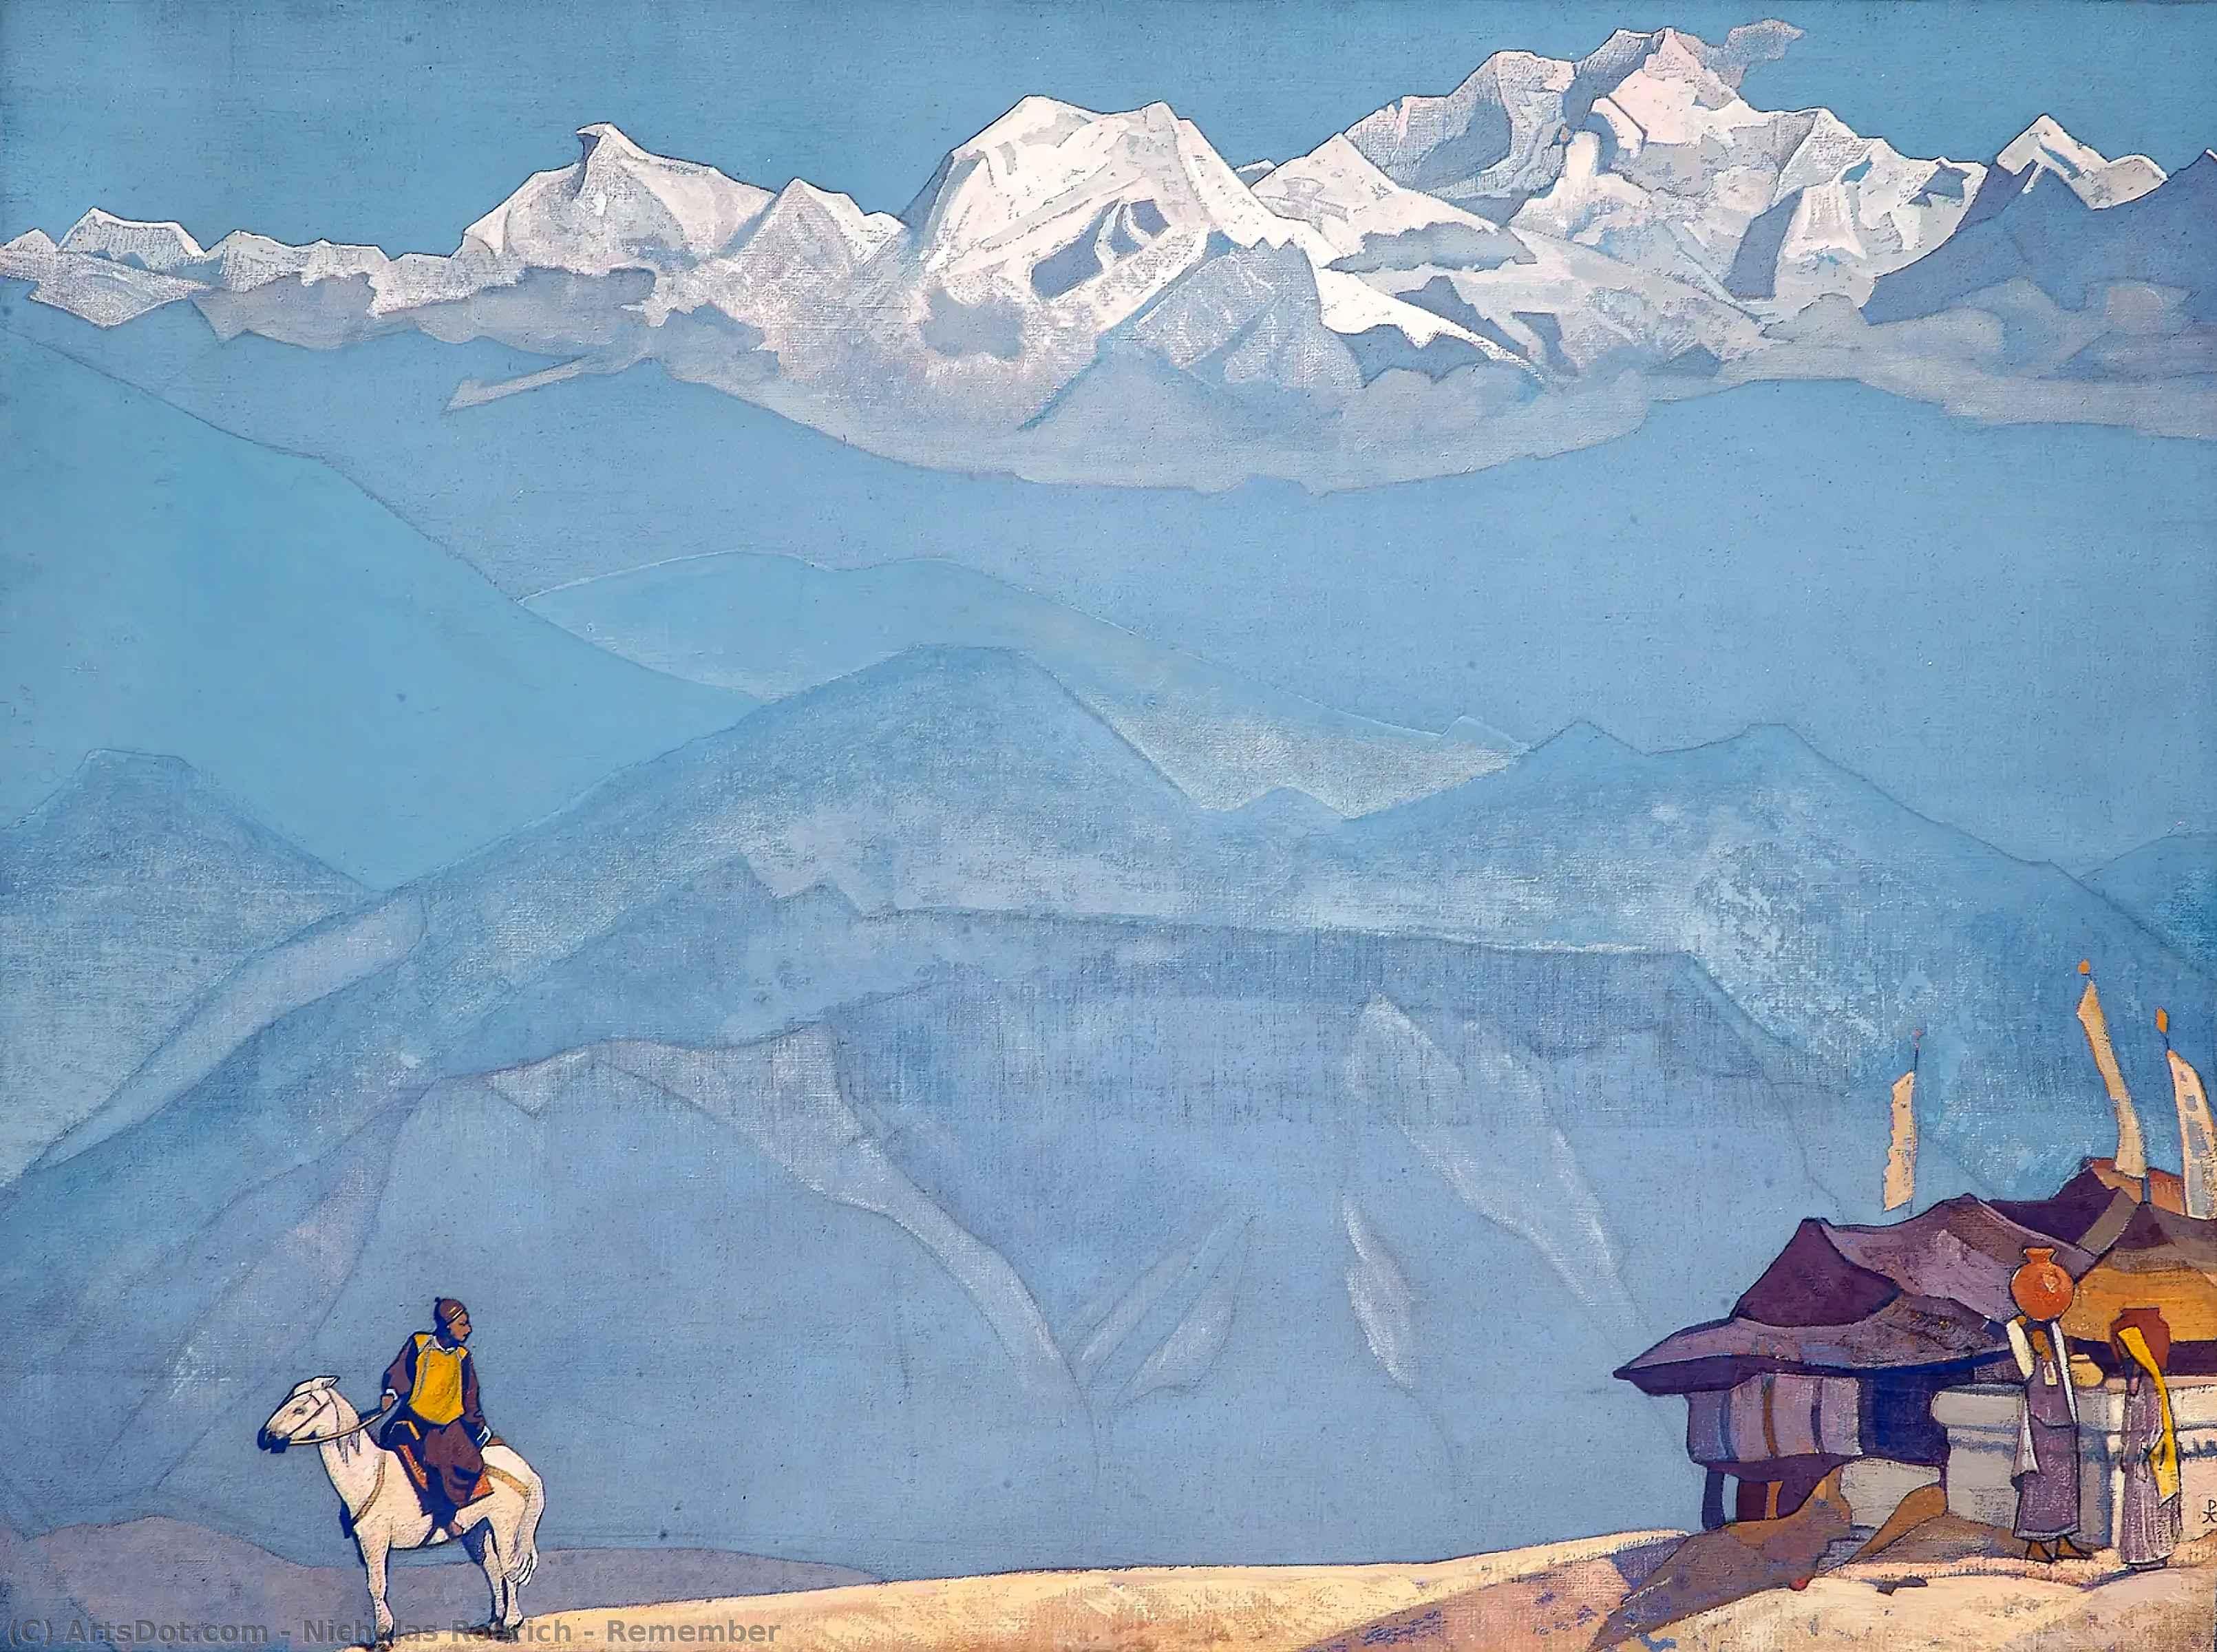 Wikoo.org - موسوعة الفنون الجميلة - اللوحة، العمل الفني Nicholas Roerich - Remember